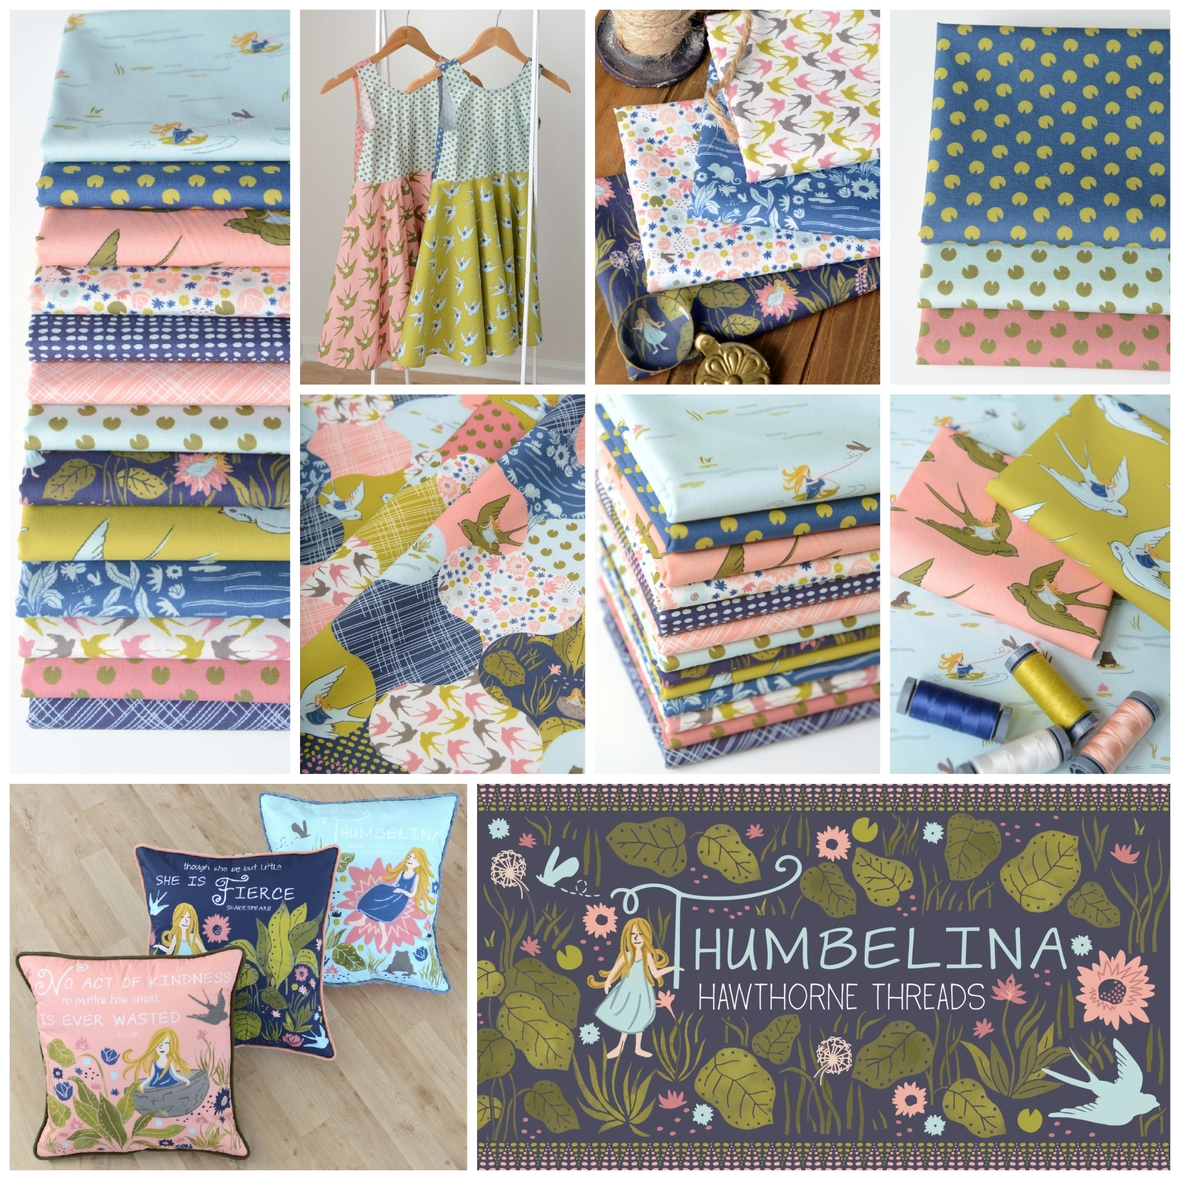 Hawthorne Threads Thumbelina Fabric Poster 2800